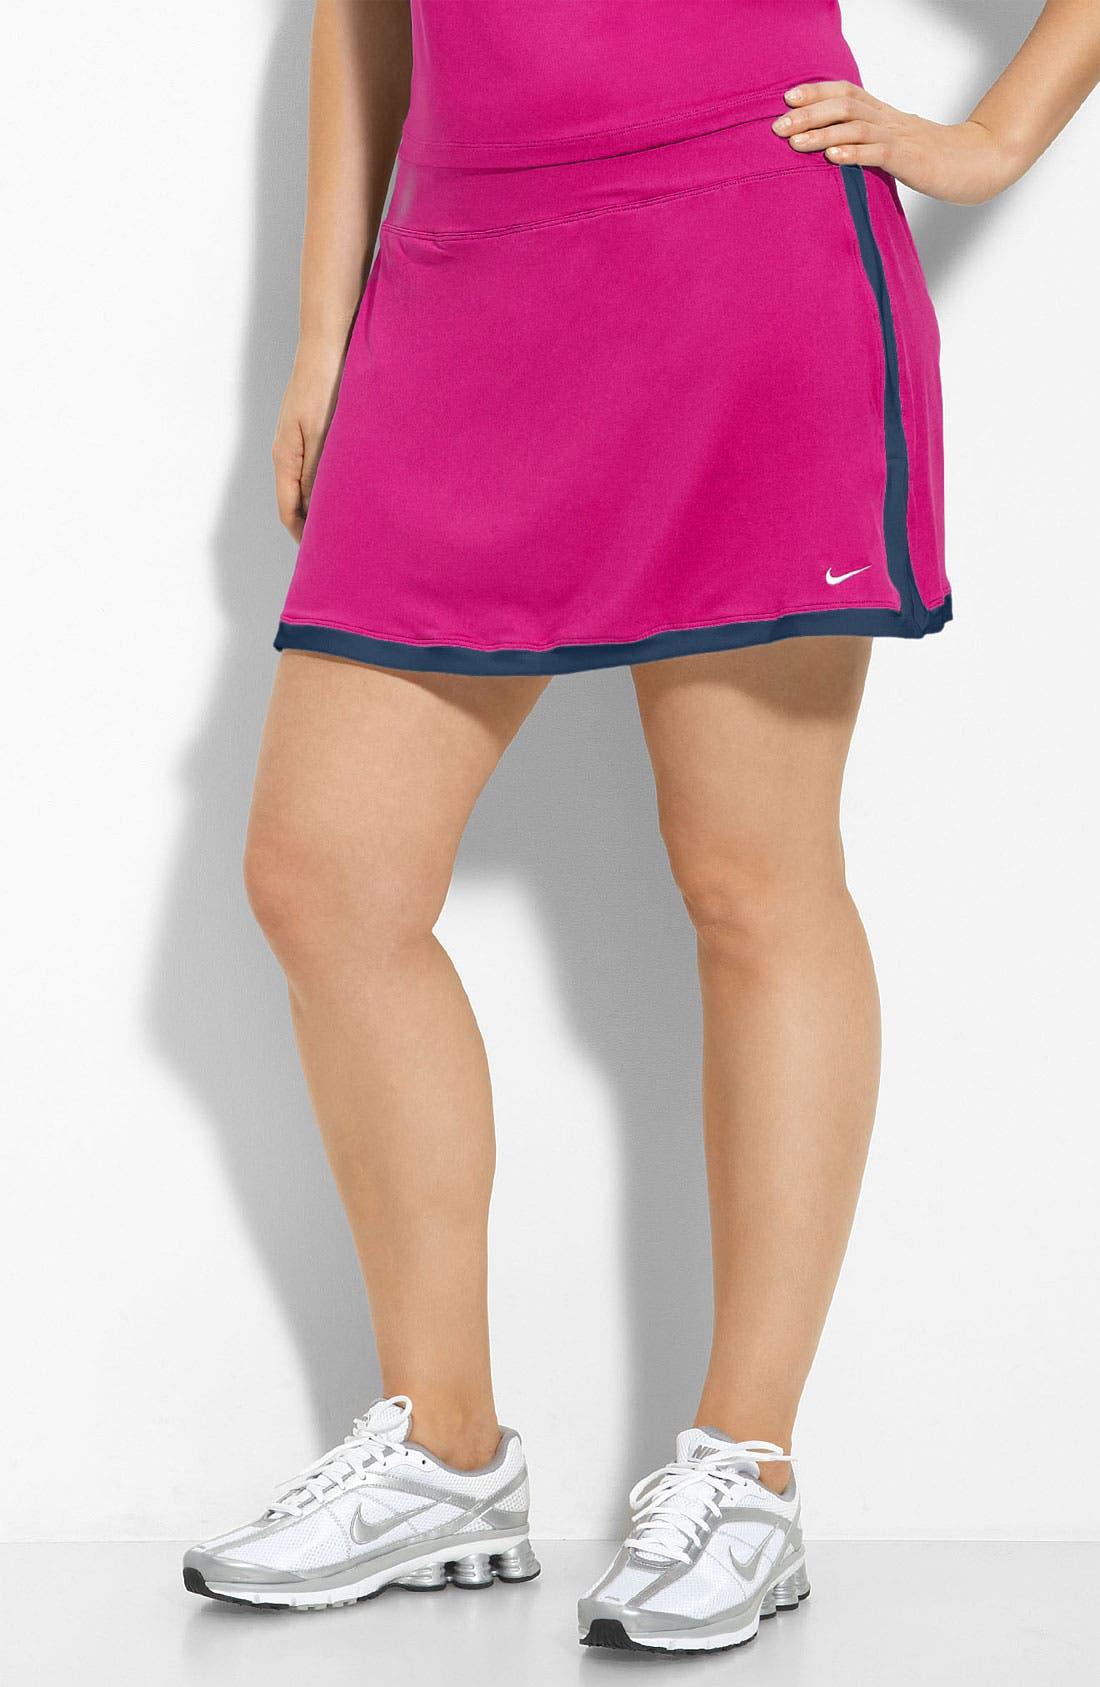 Alternate Image 1 Selected - Nike 'Border' Dri-FIT Tennis Skirt (Plus)